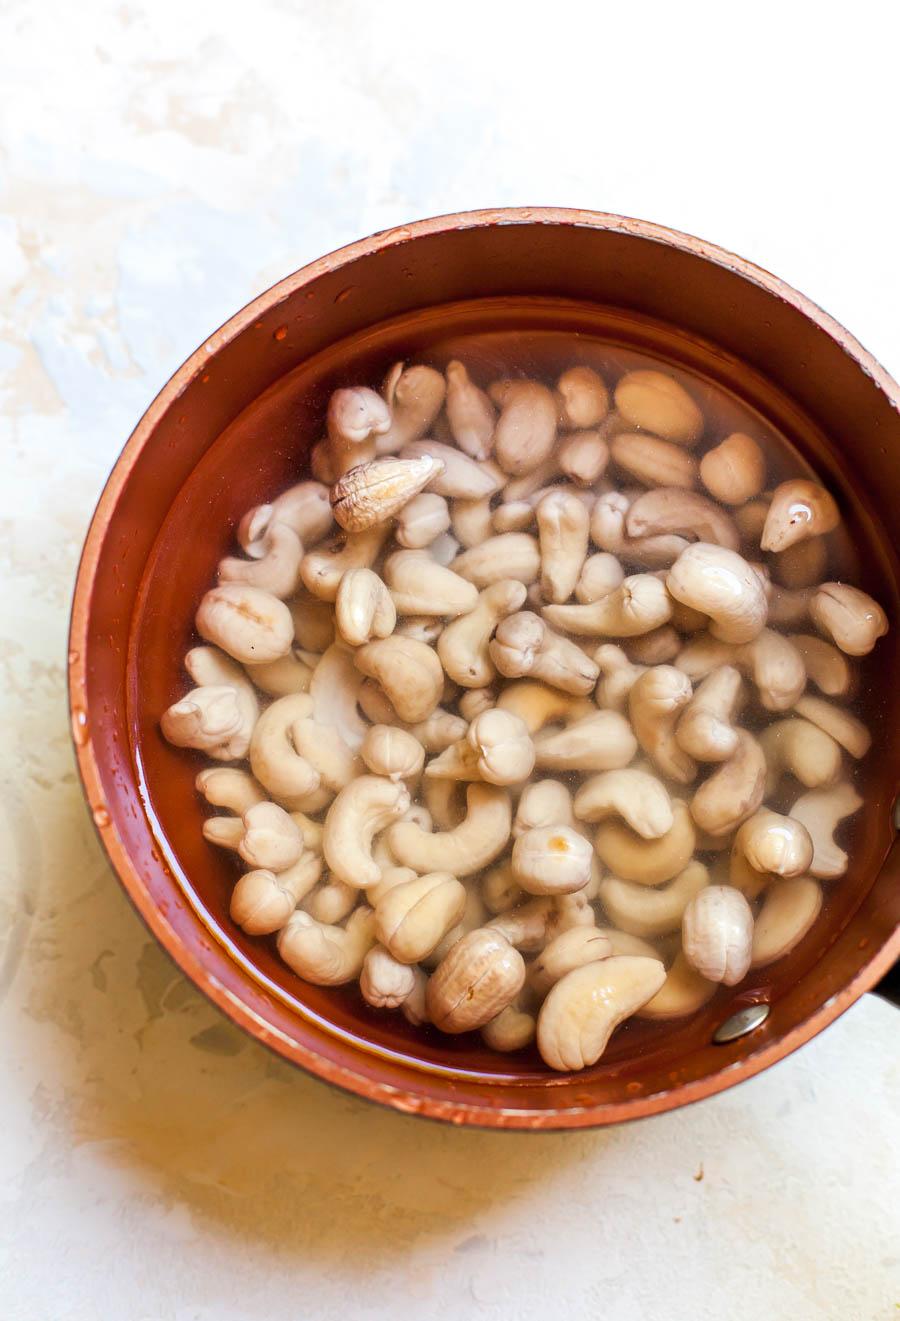 Soaked Raw Cashews